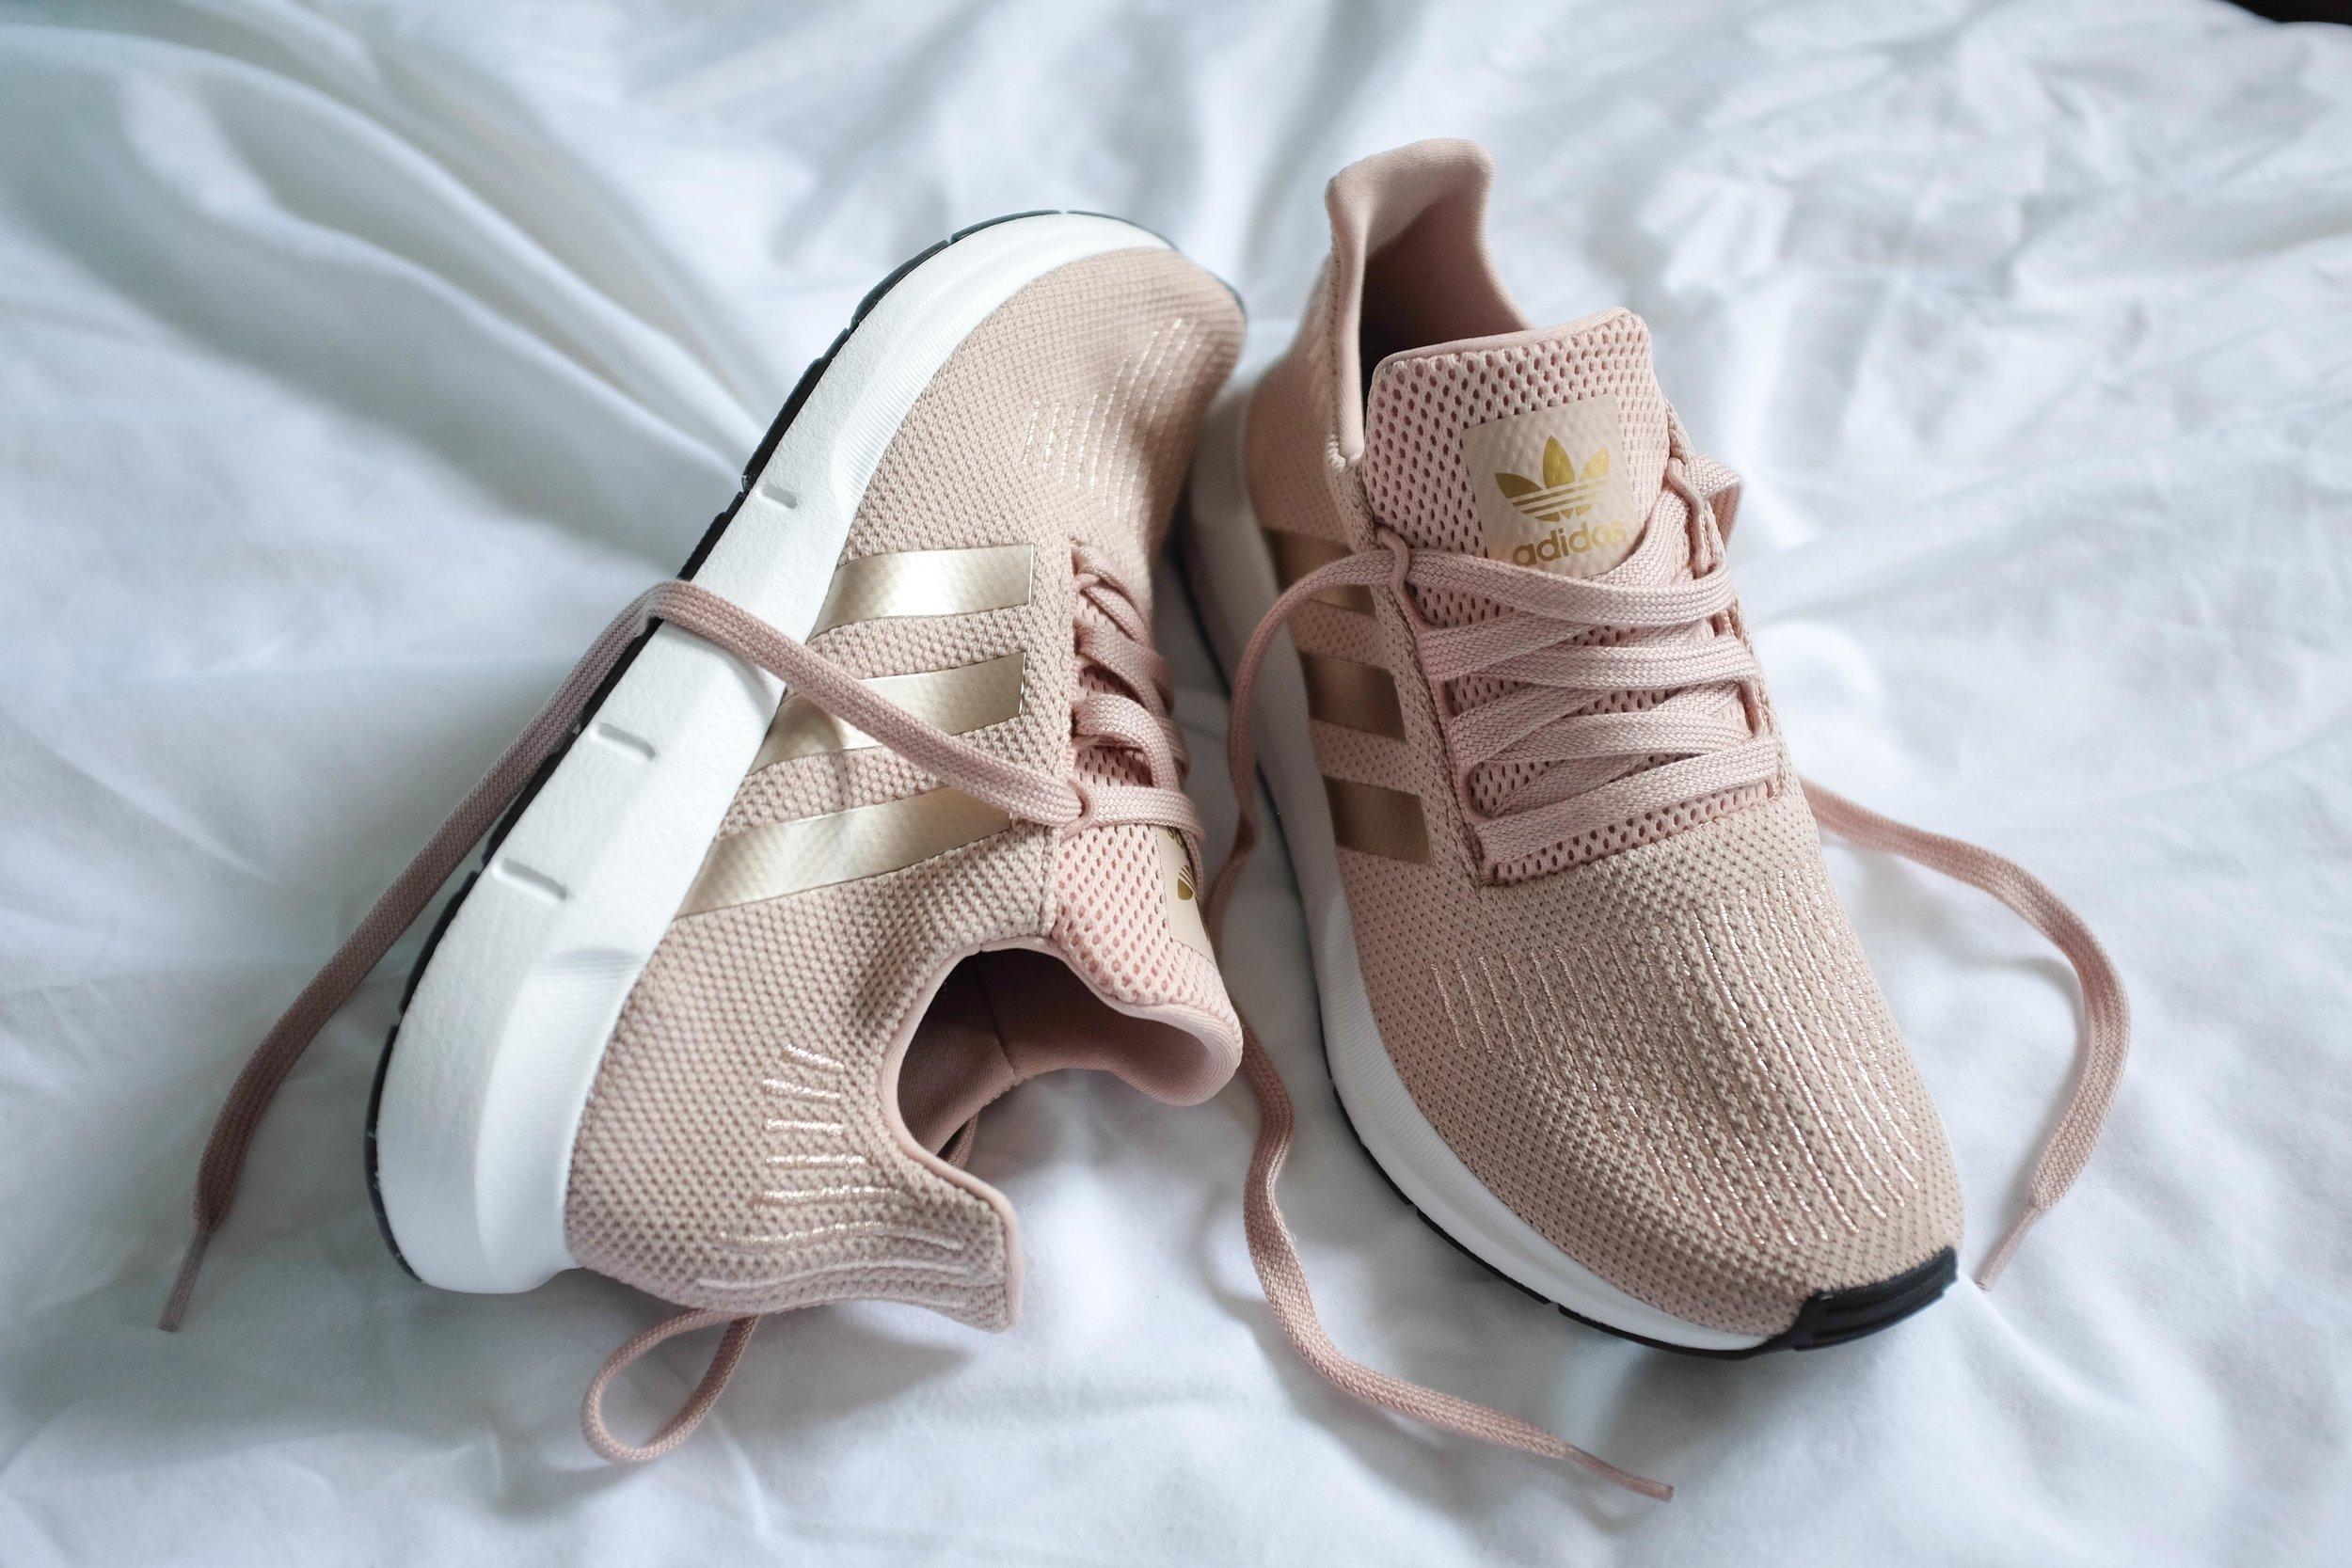 cffc86bff Adidas Originals Swift Run in Dust Pearl — Nezuki